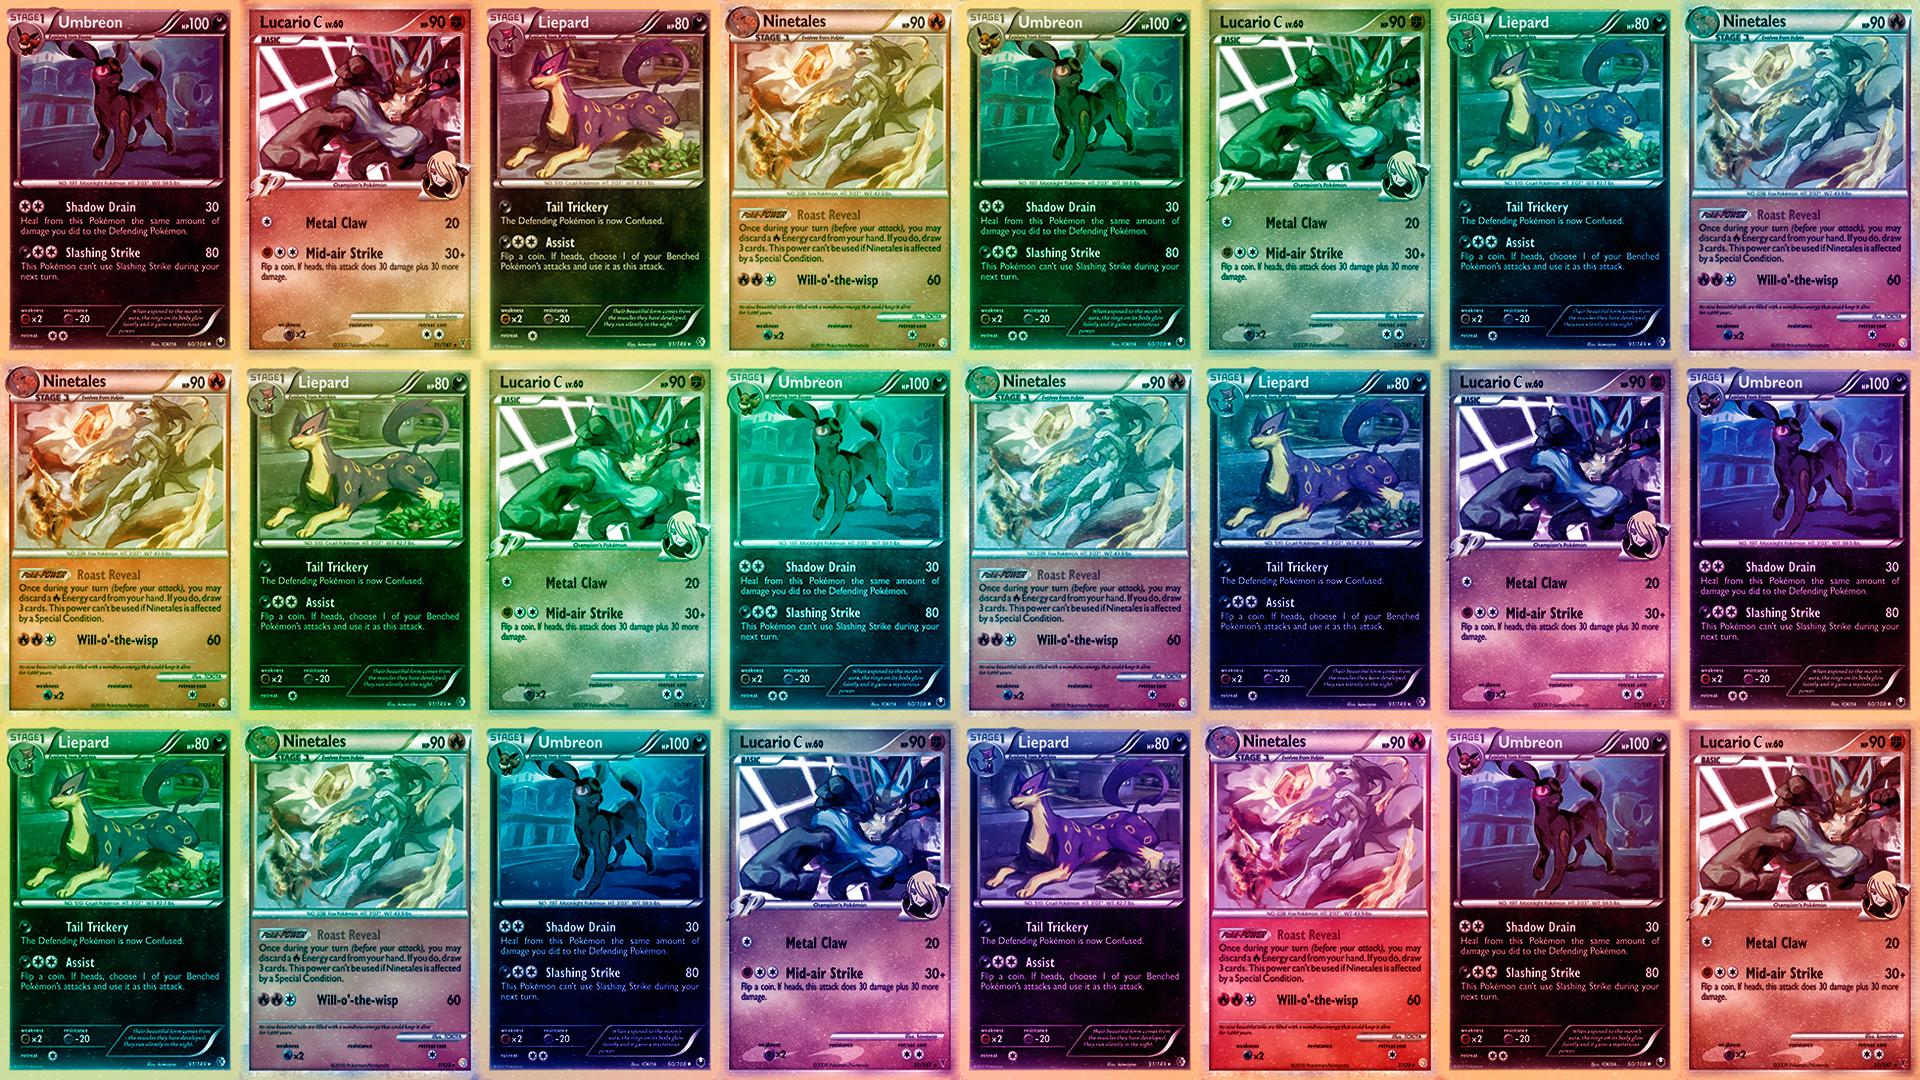 Pokemon TCG Wallpaper by 77SilentCrow Pokemon TCG Wallpaper by 77SilentCrow